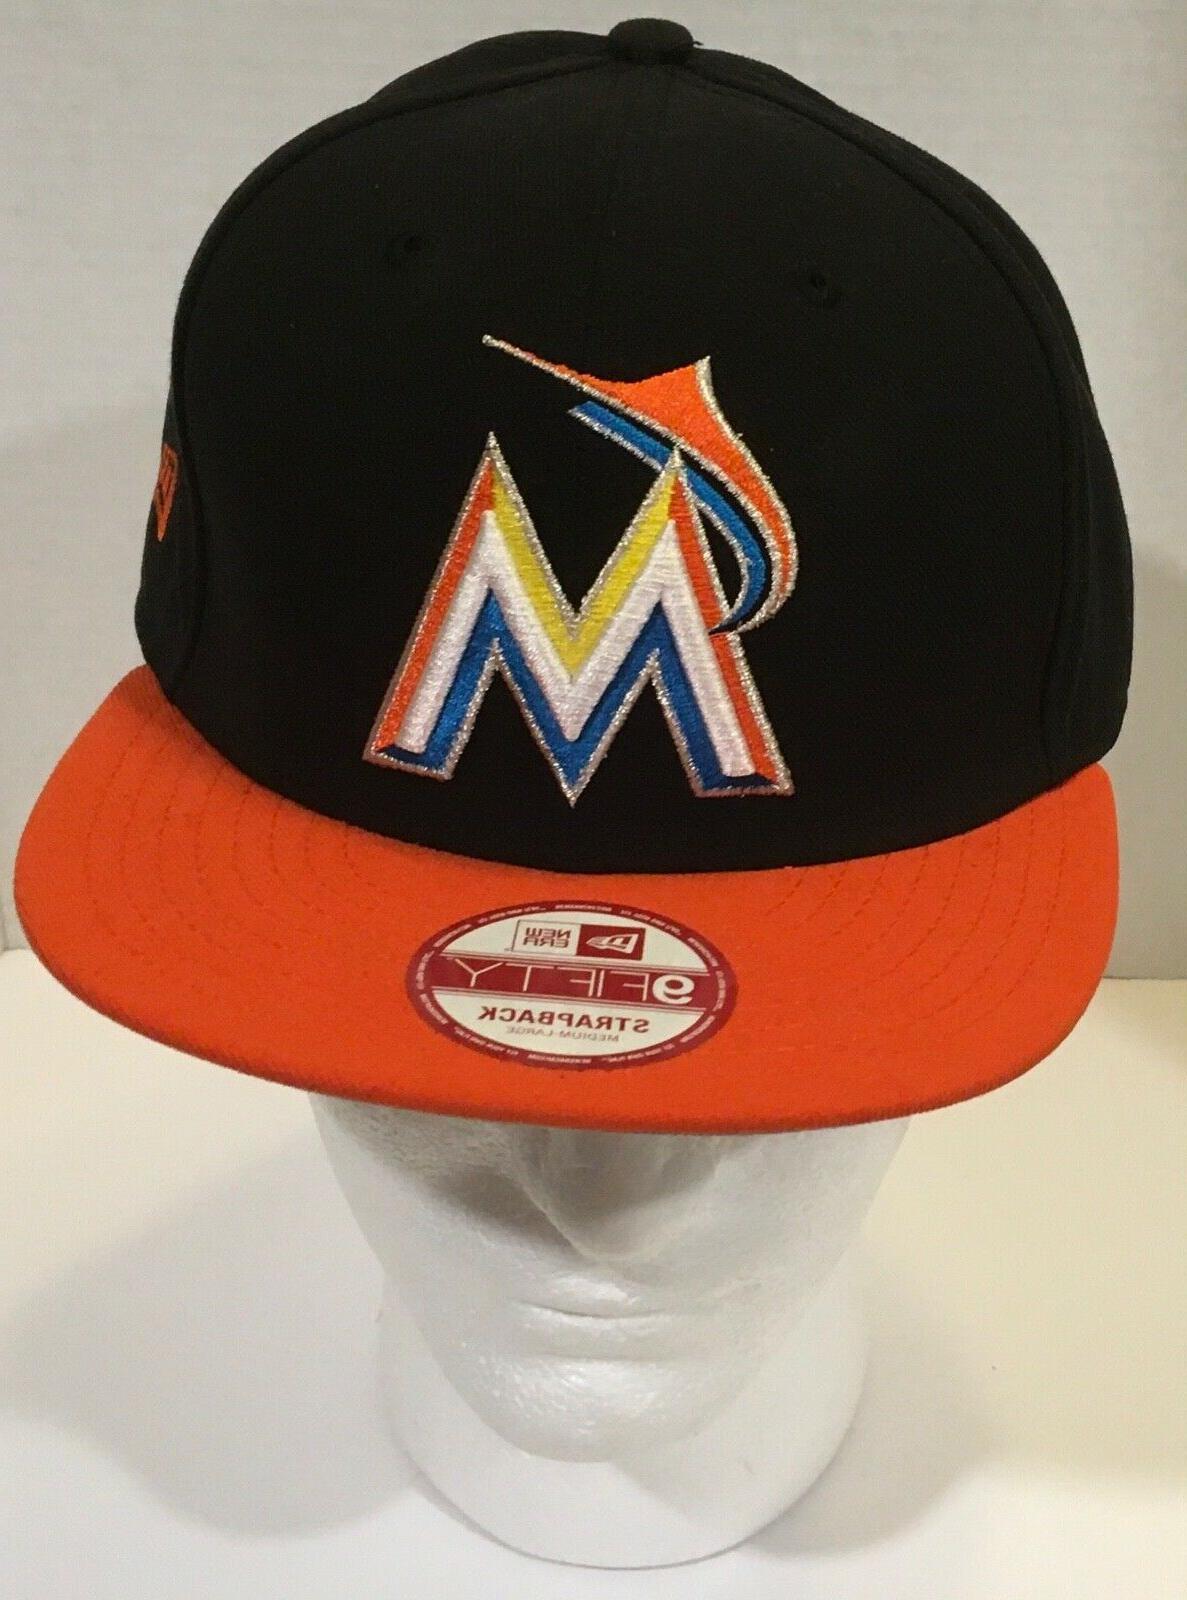 New Era SnapBack Hats